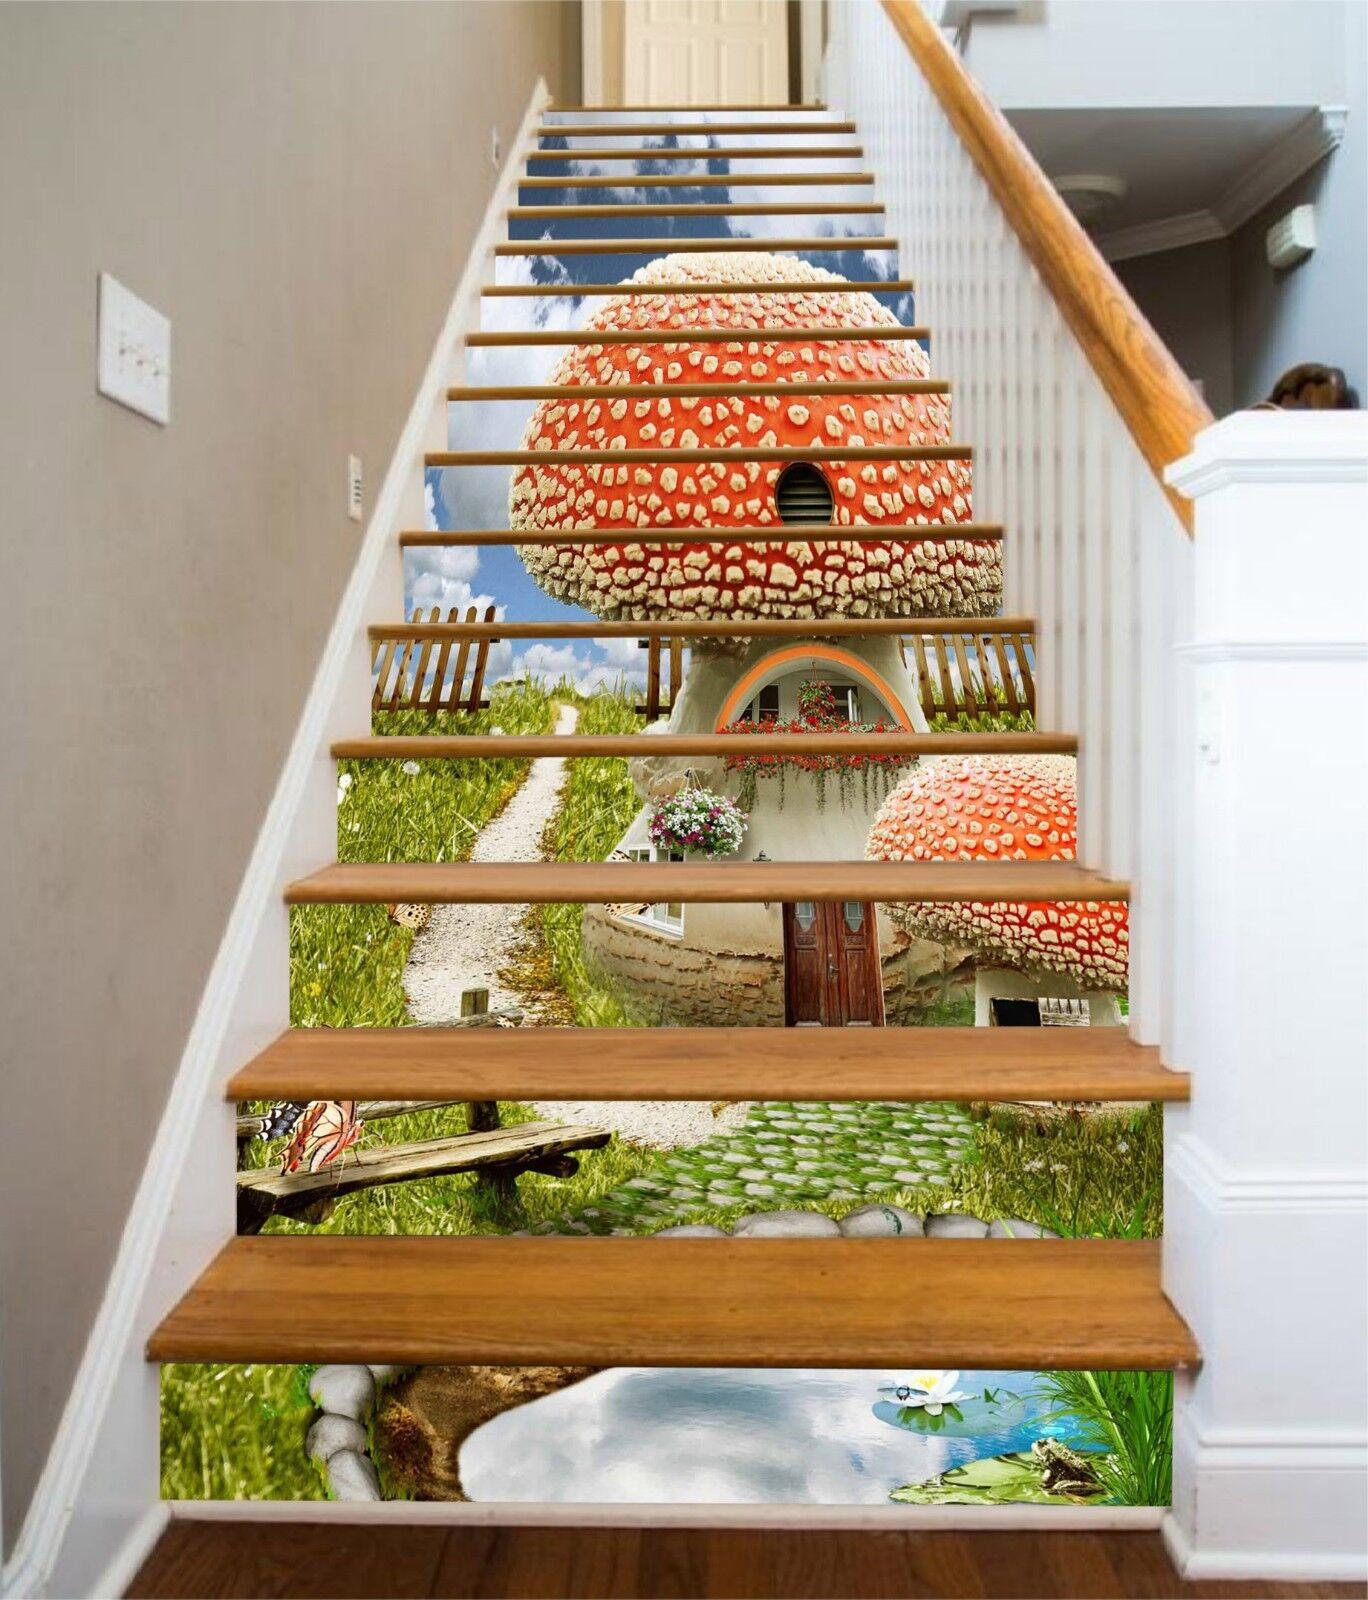 Decal Vinyl Mural Decoration Risers Stair Mushroom 3d